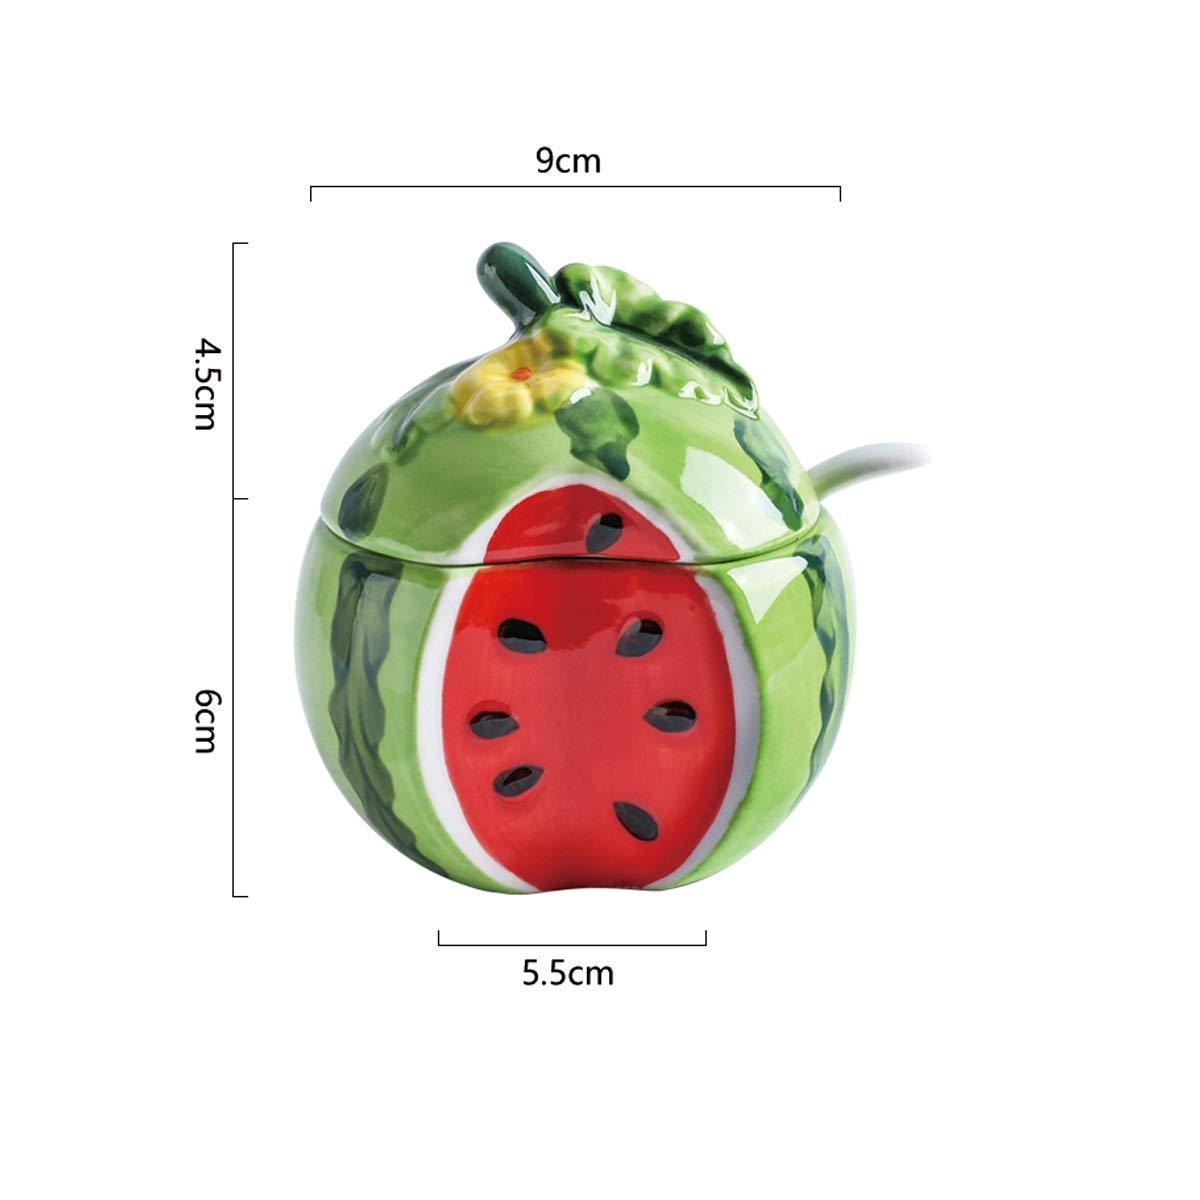 MINGRUIGONGMAO Sherrie creative home fruit embossed ceramic seasoning jar watermelon styling seasoning box personality cute with lid salt cans Plush toys (Color : A) by MINGRUIGONGMAO